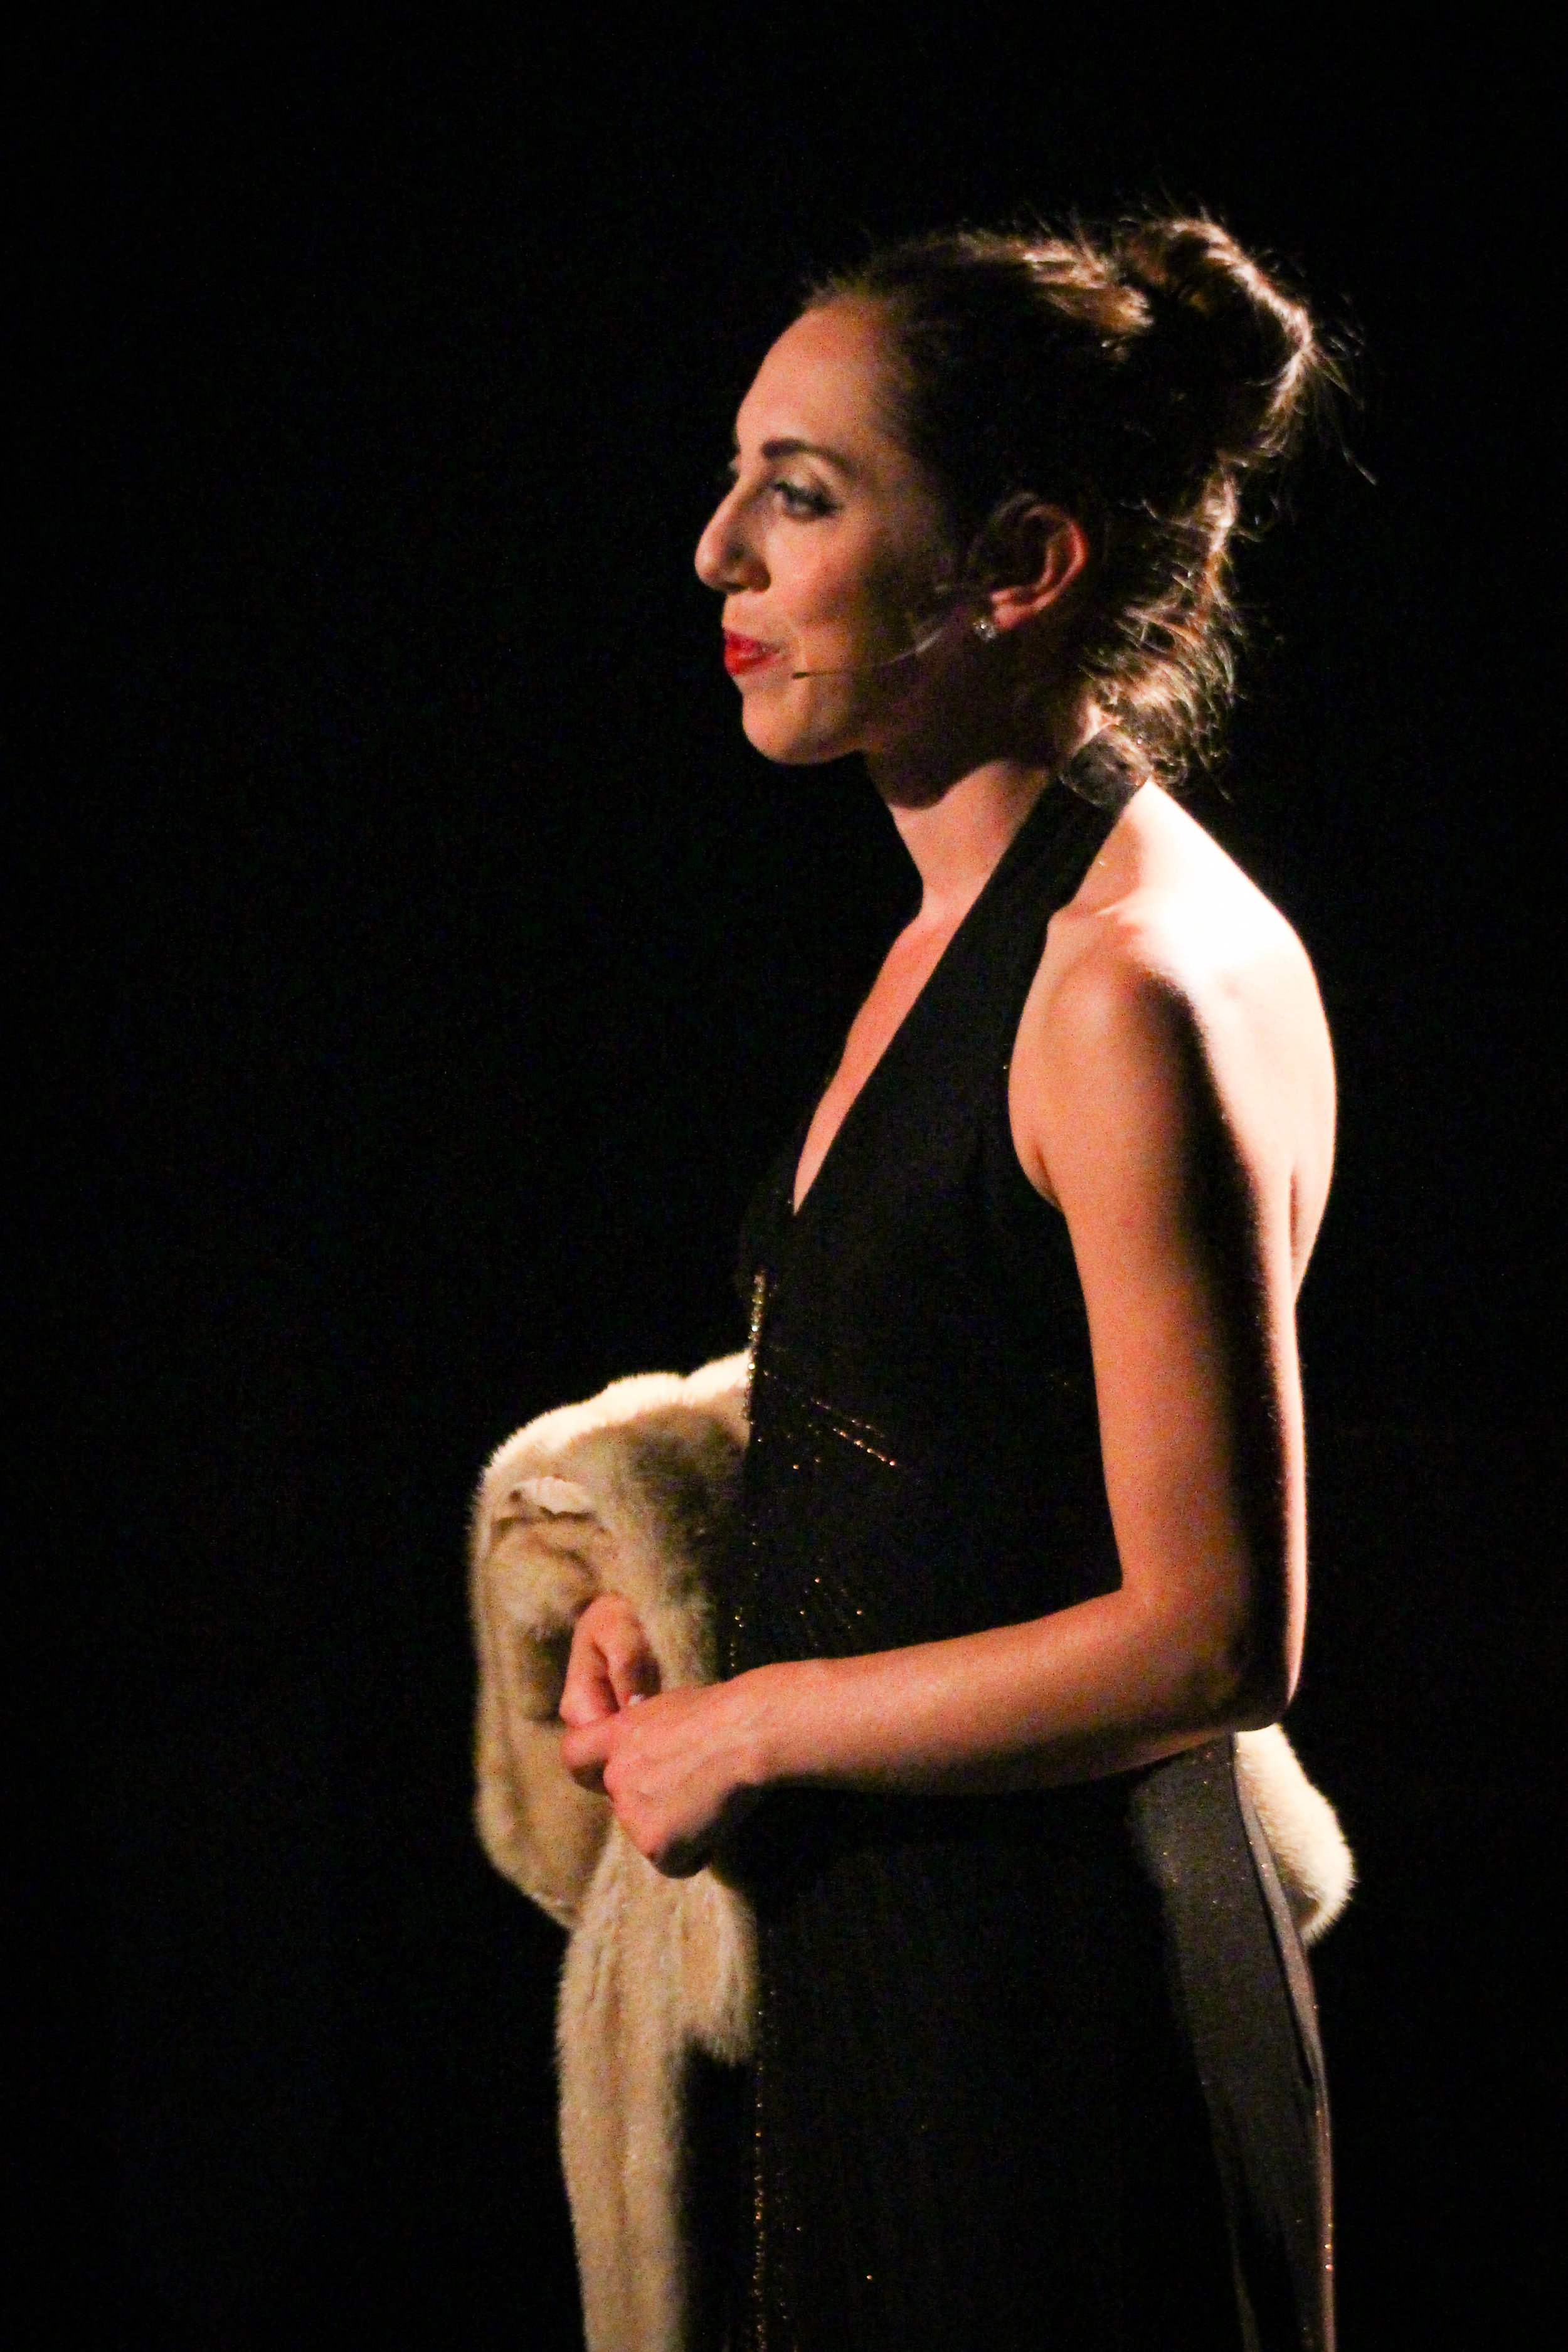 Kate Simone (Photo by Joe Landry)